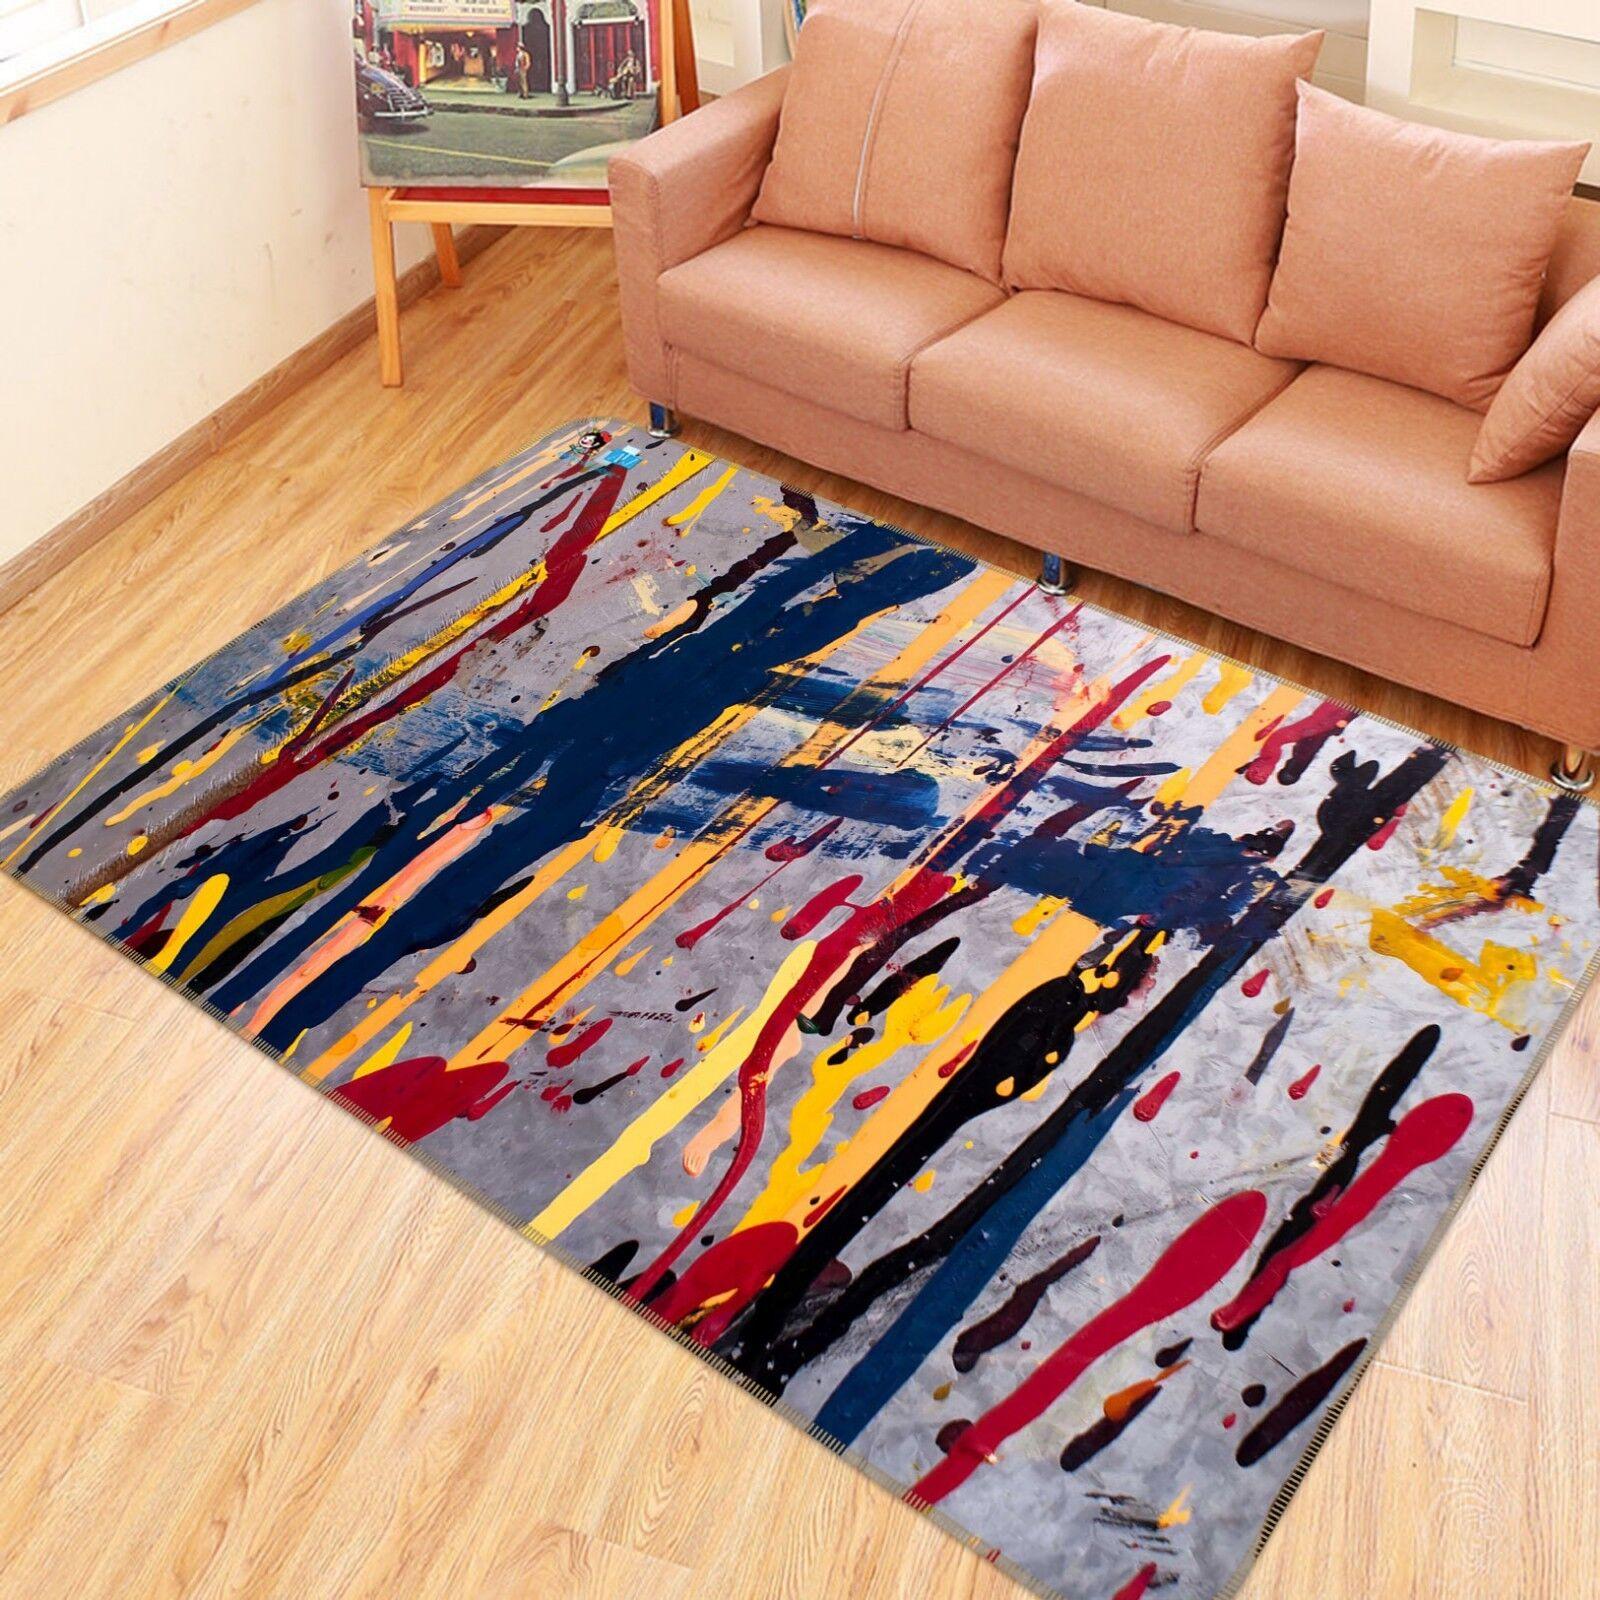 3D Mush Up Paint 289 Non Slip Rug Mat Quality Elegant Photo Carpet US Cobb